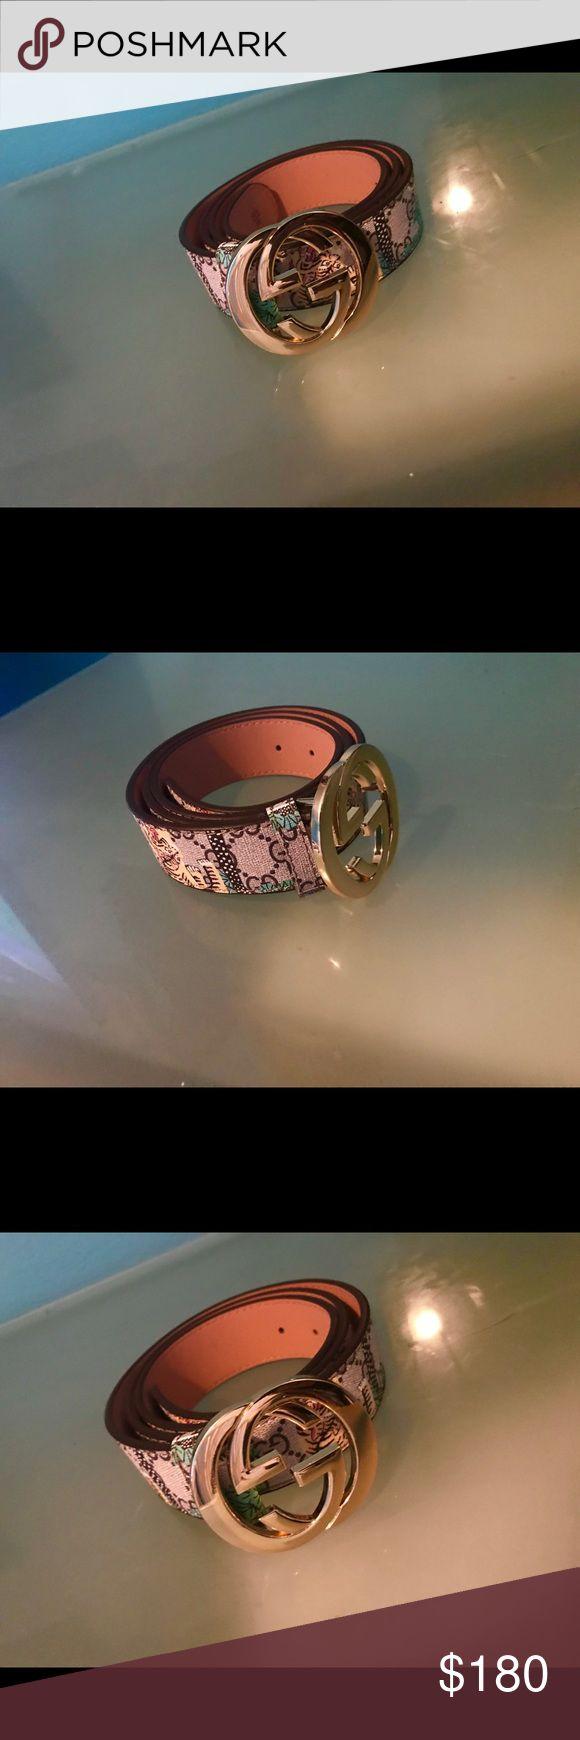 Gucci Belt Gucci Belt brand new Gucci Accessories Belts